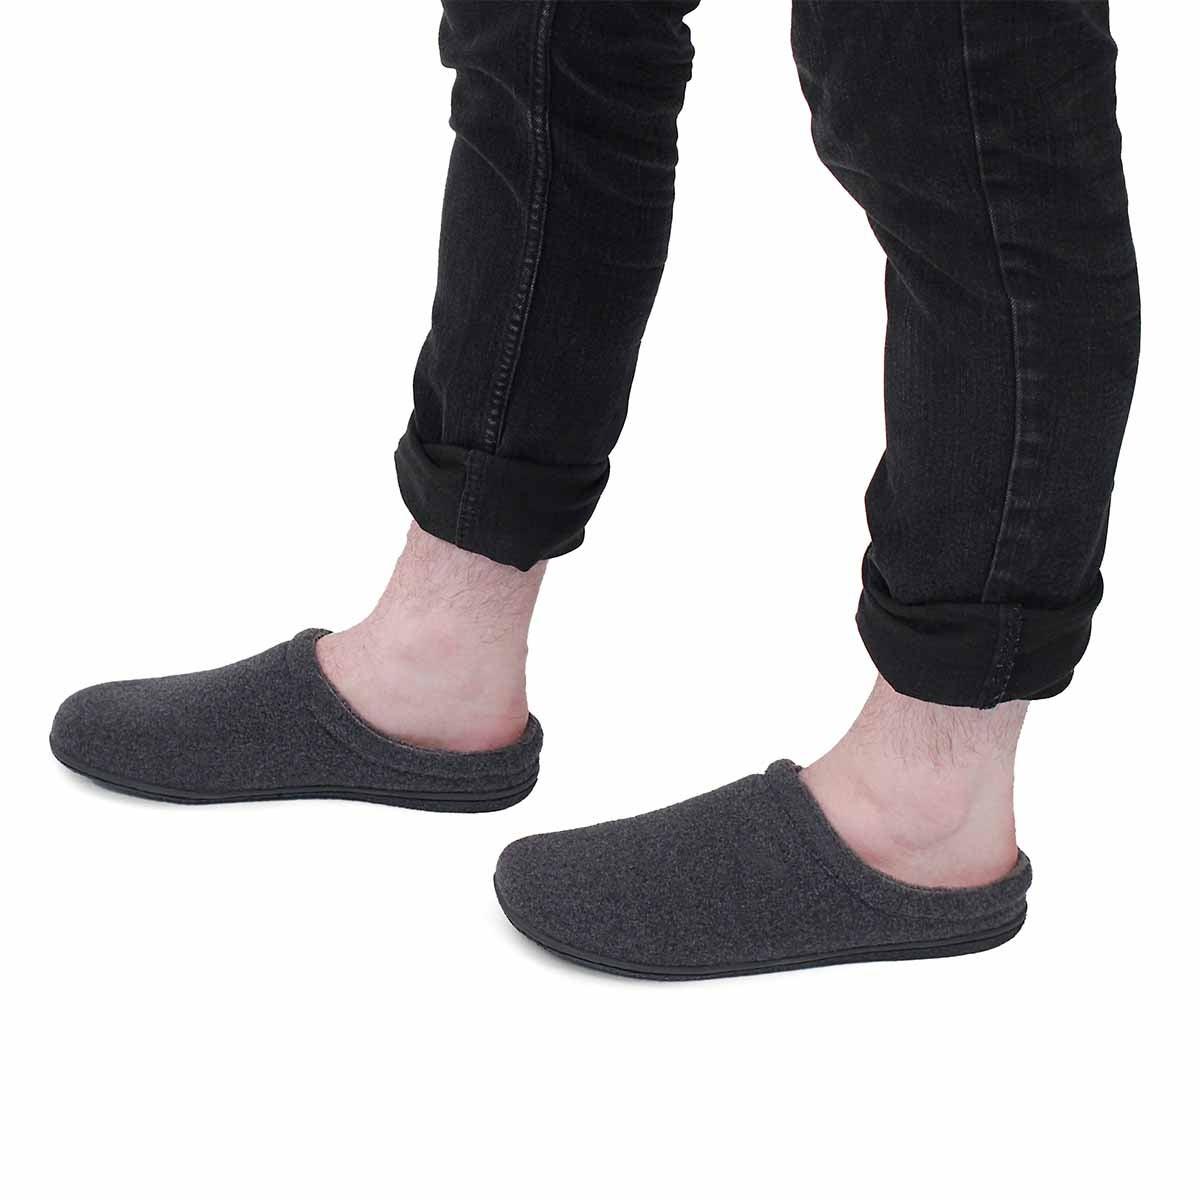 Mns Carver dark grey open back slipper